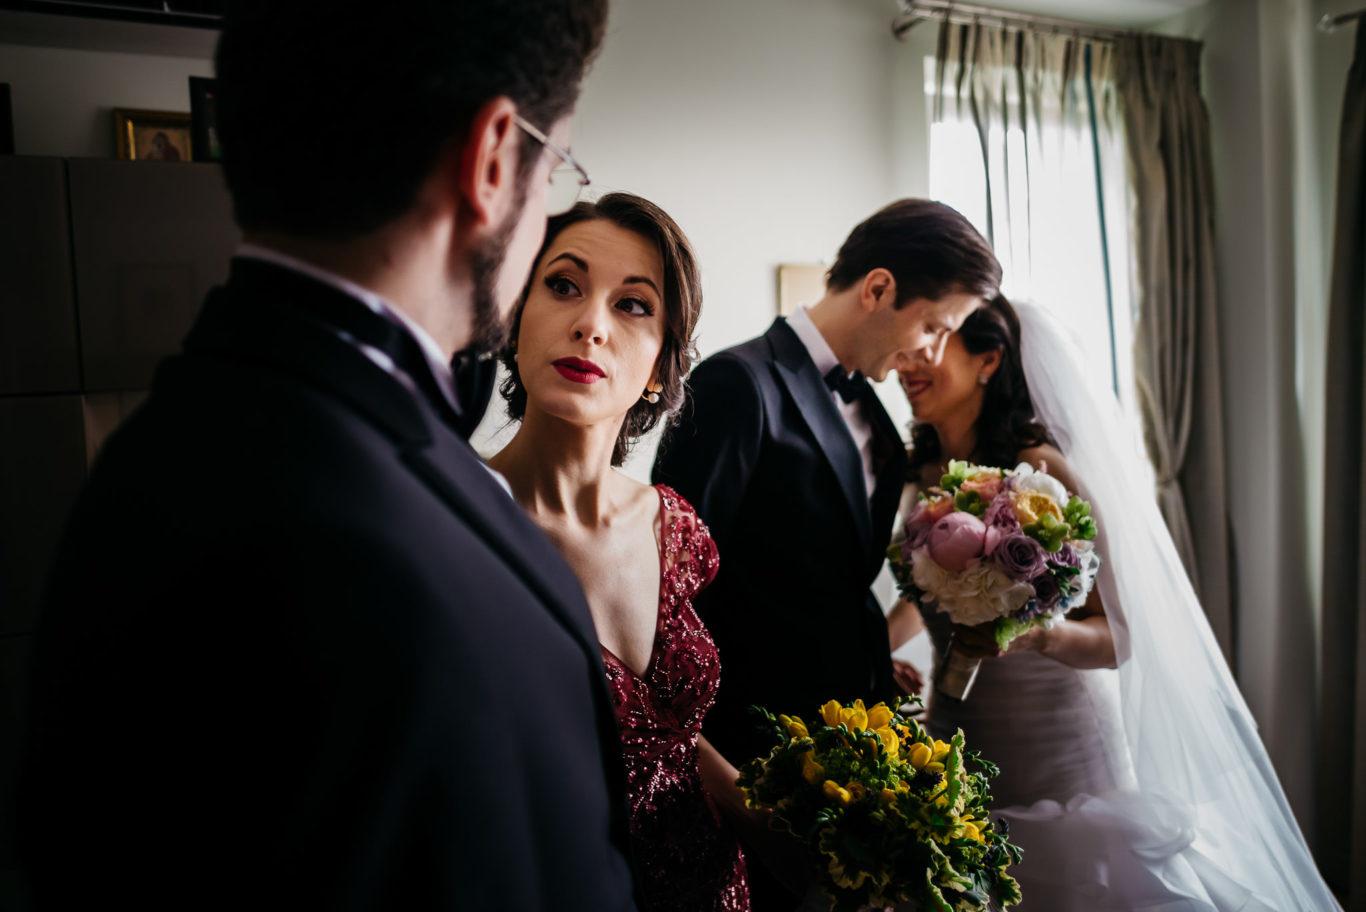 0322-Fotografie-nunta-Simona-Valentin-fotograf-Ciprian-Dumitrescu-DSC_1268